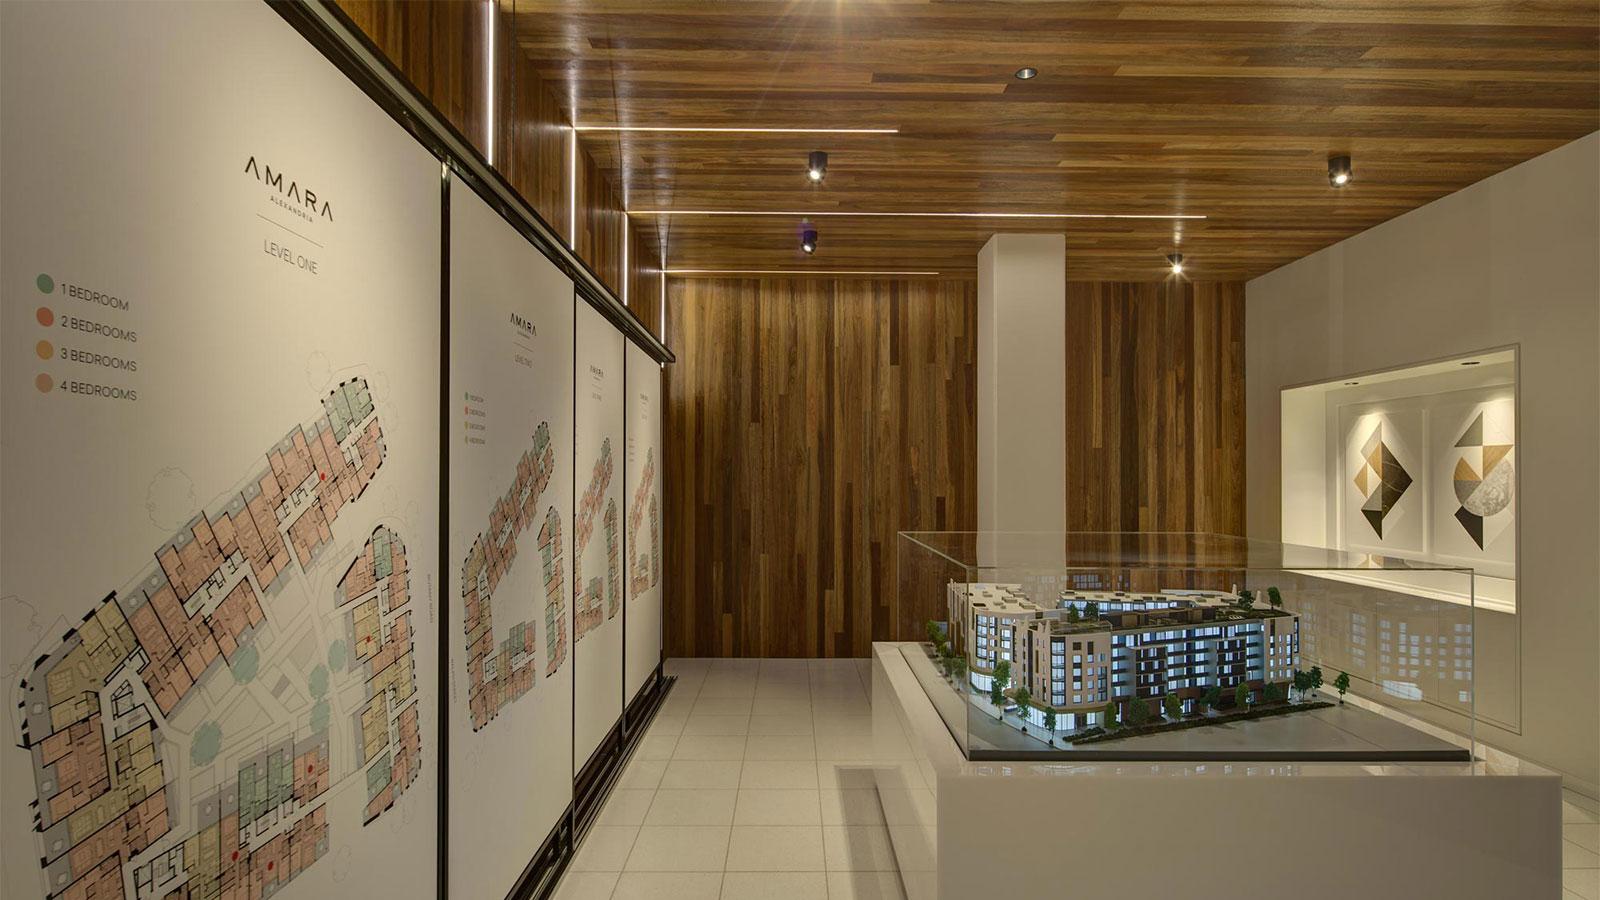 Amara display suite 00025